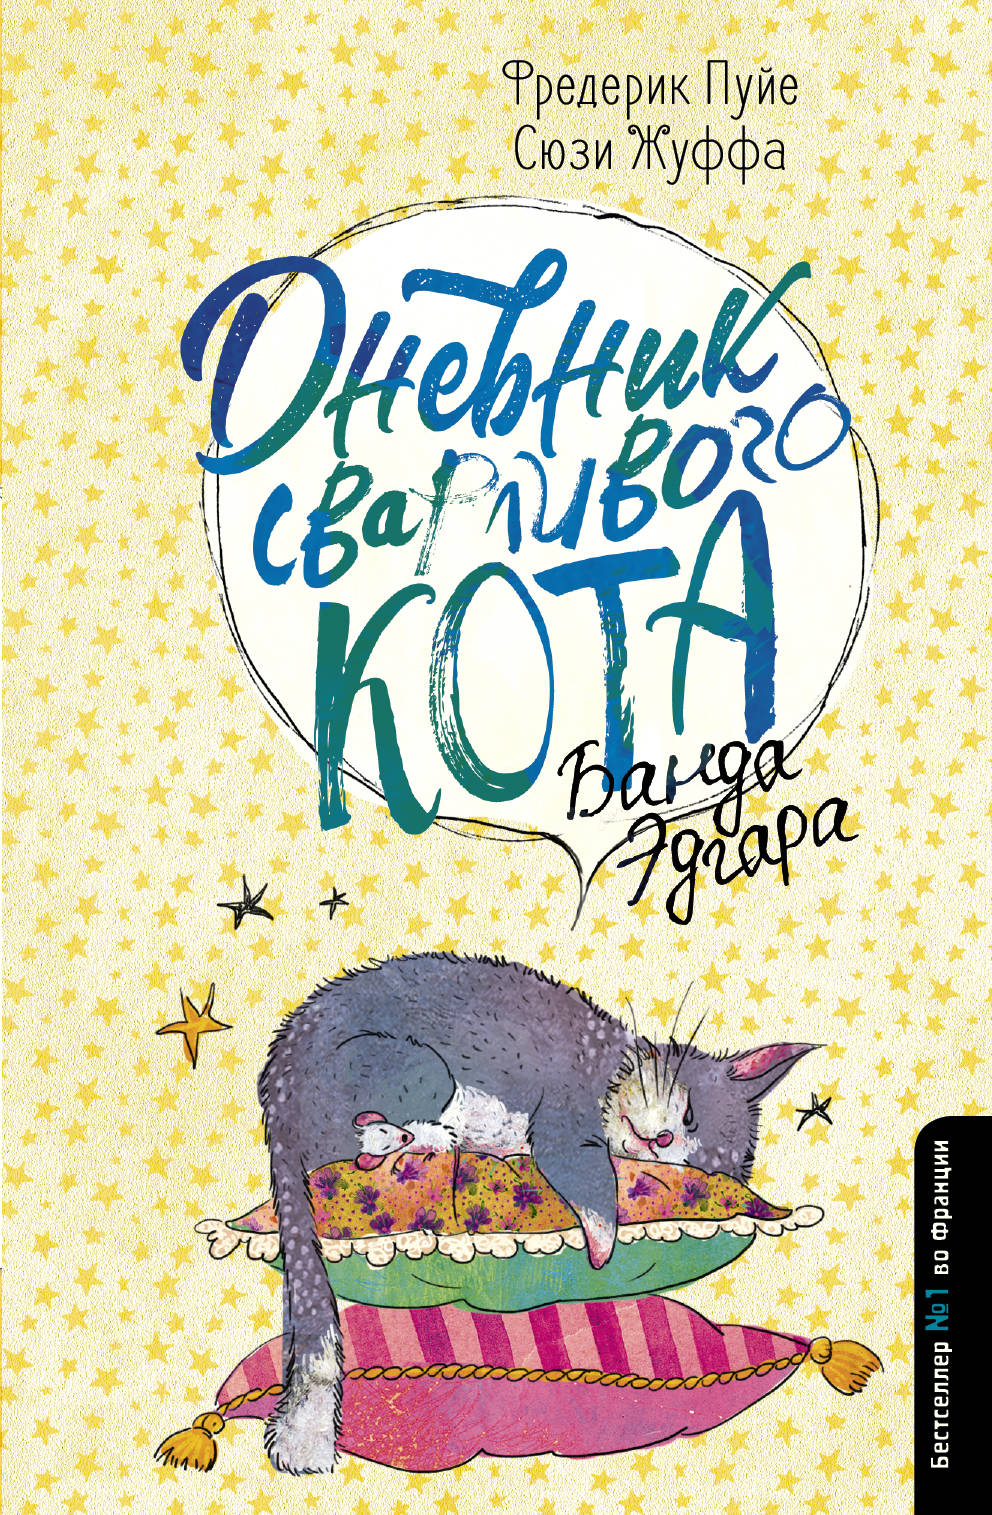 Дневник сварливого кота 2: банда Эдгара ( Пуйе Фредерик, Жуффа Сюзи  )